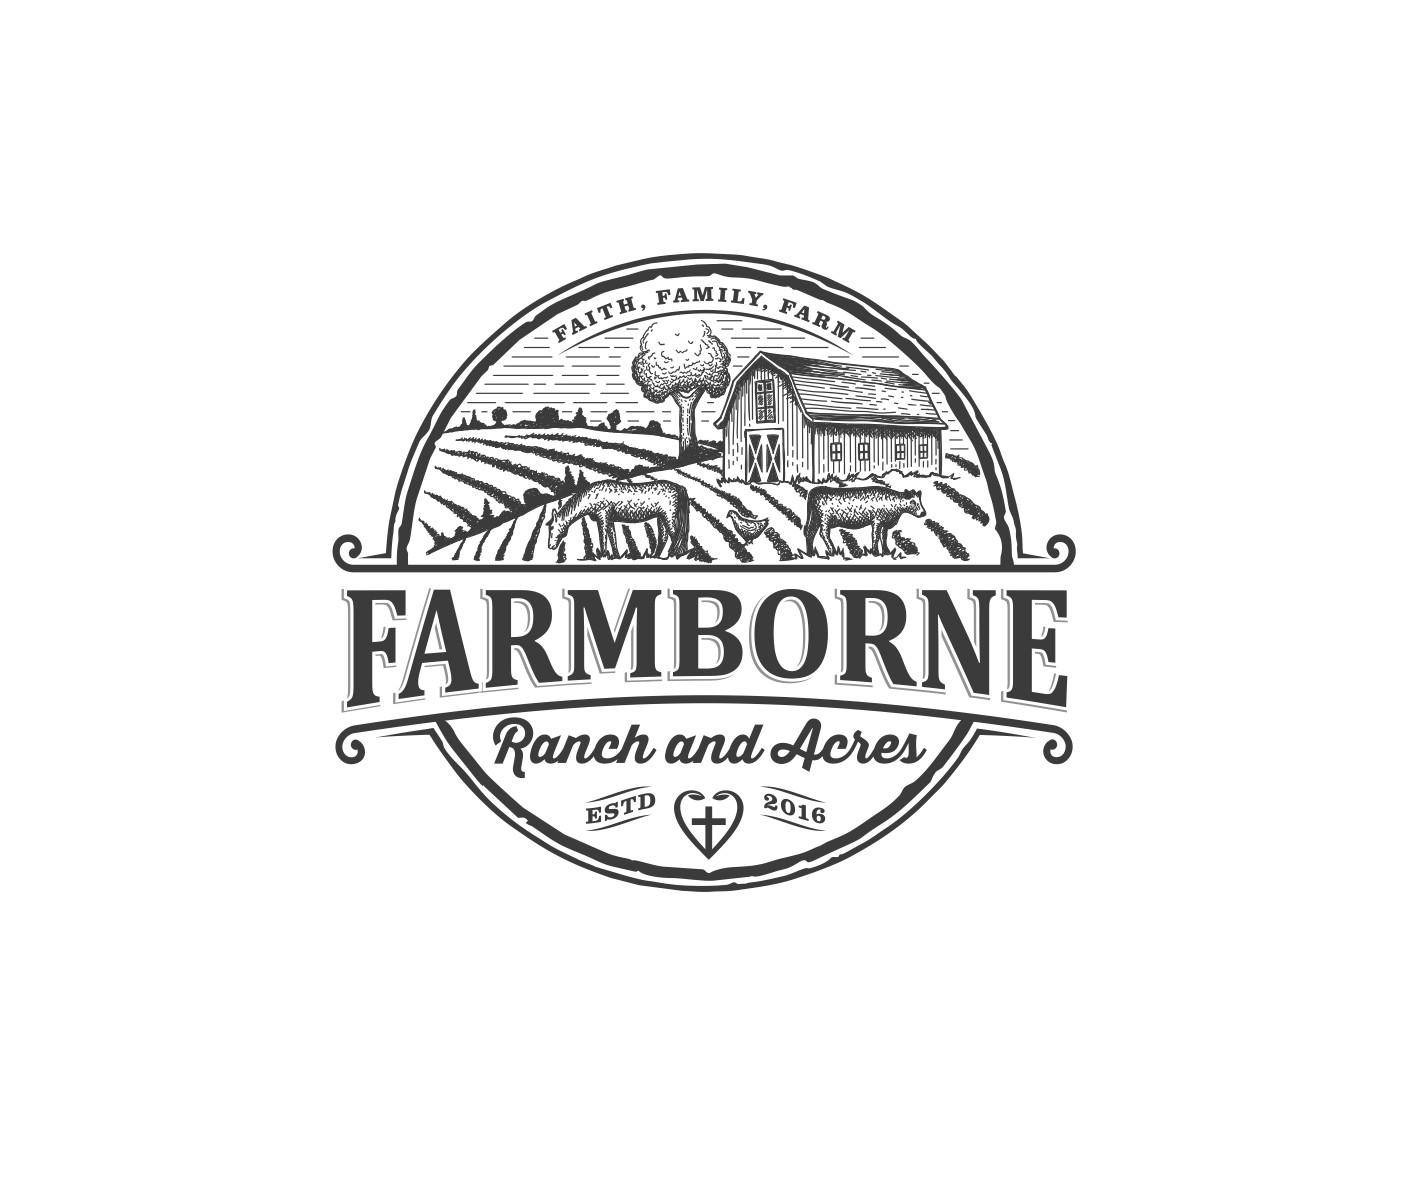 Farmers need you! Niche market farm needs your expert logo